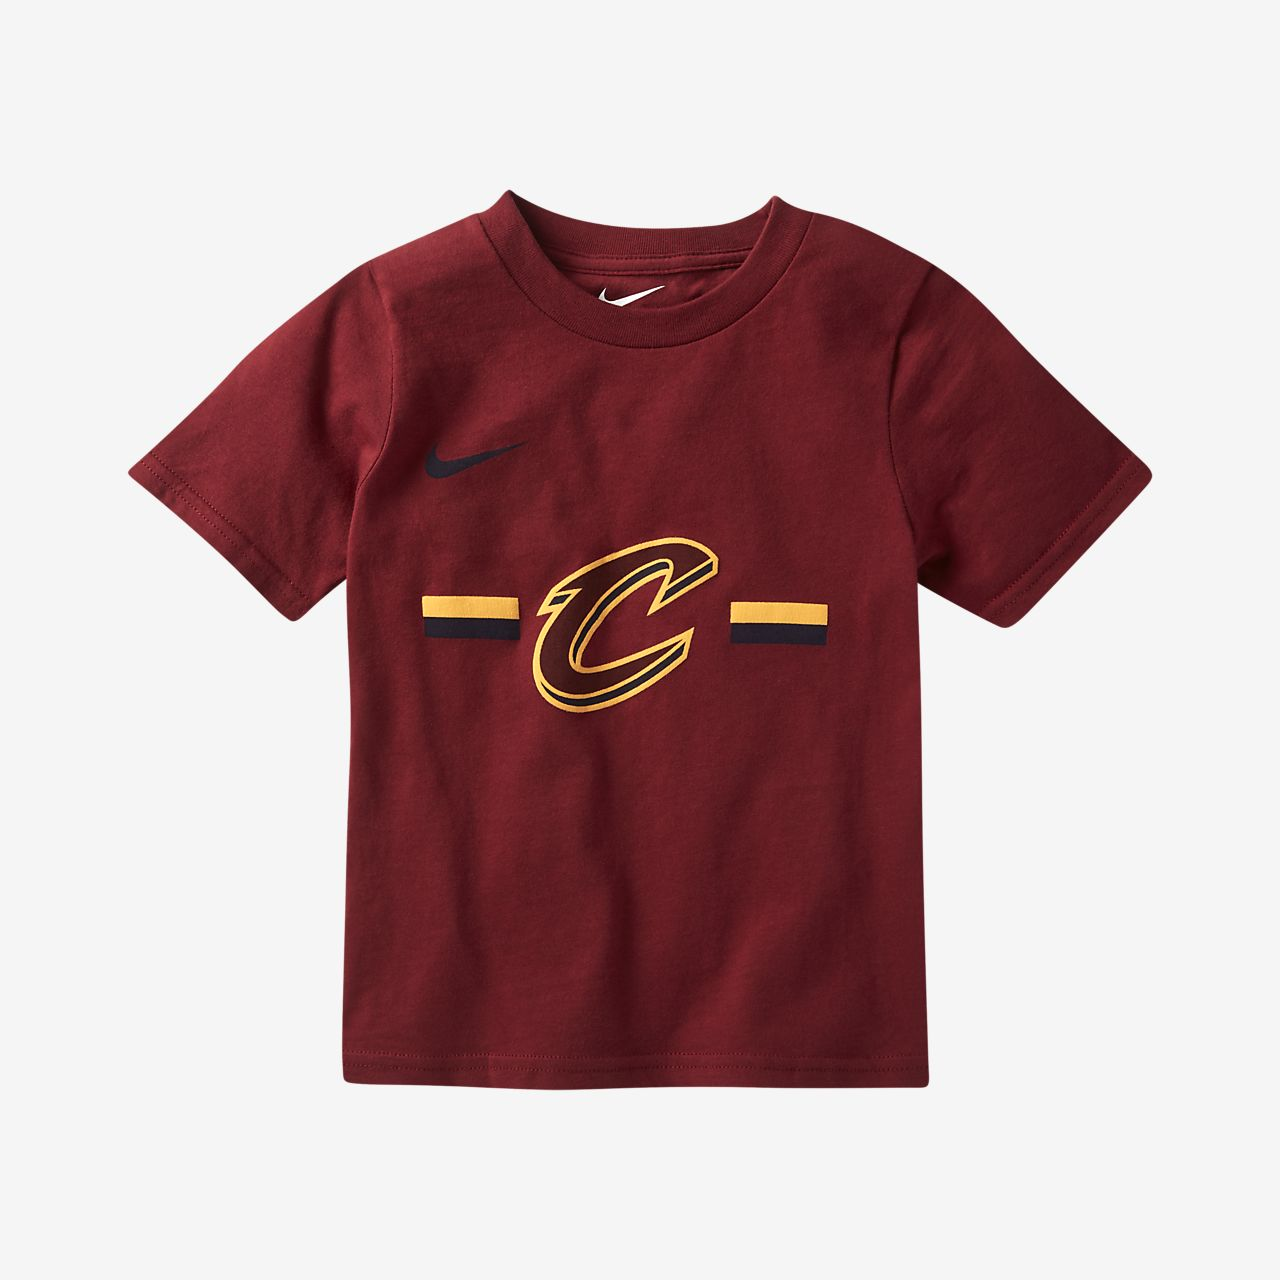 1e291ead Cleveland Cavaliers Nike Logo Toddler NBA T-Shirt. Nike.com